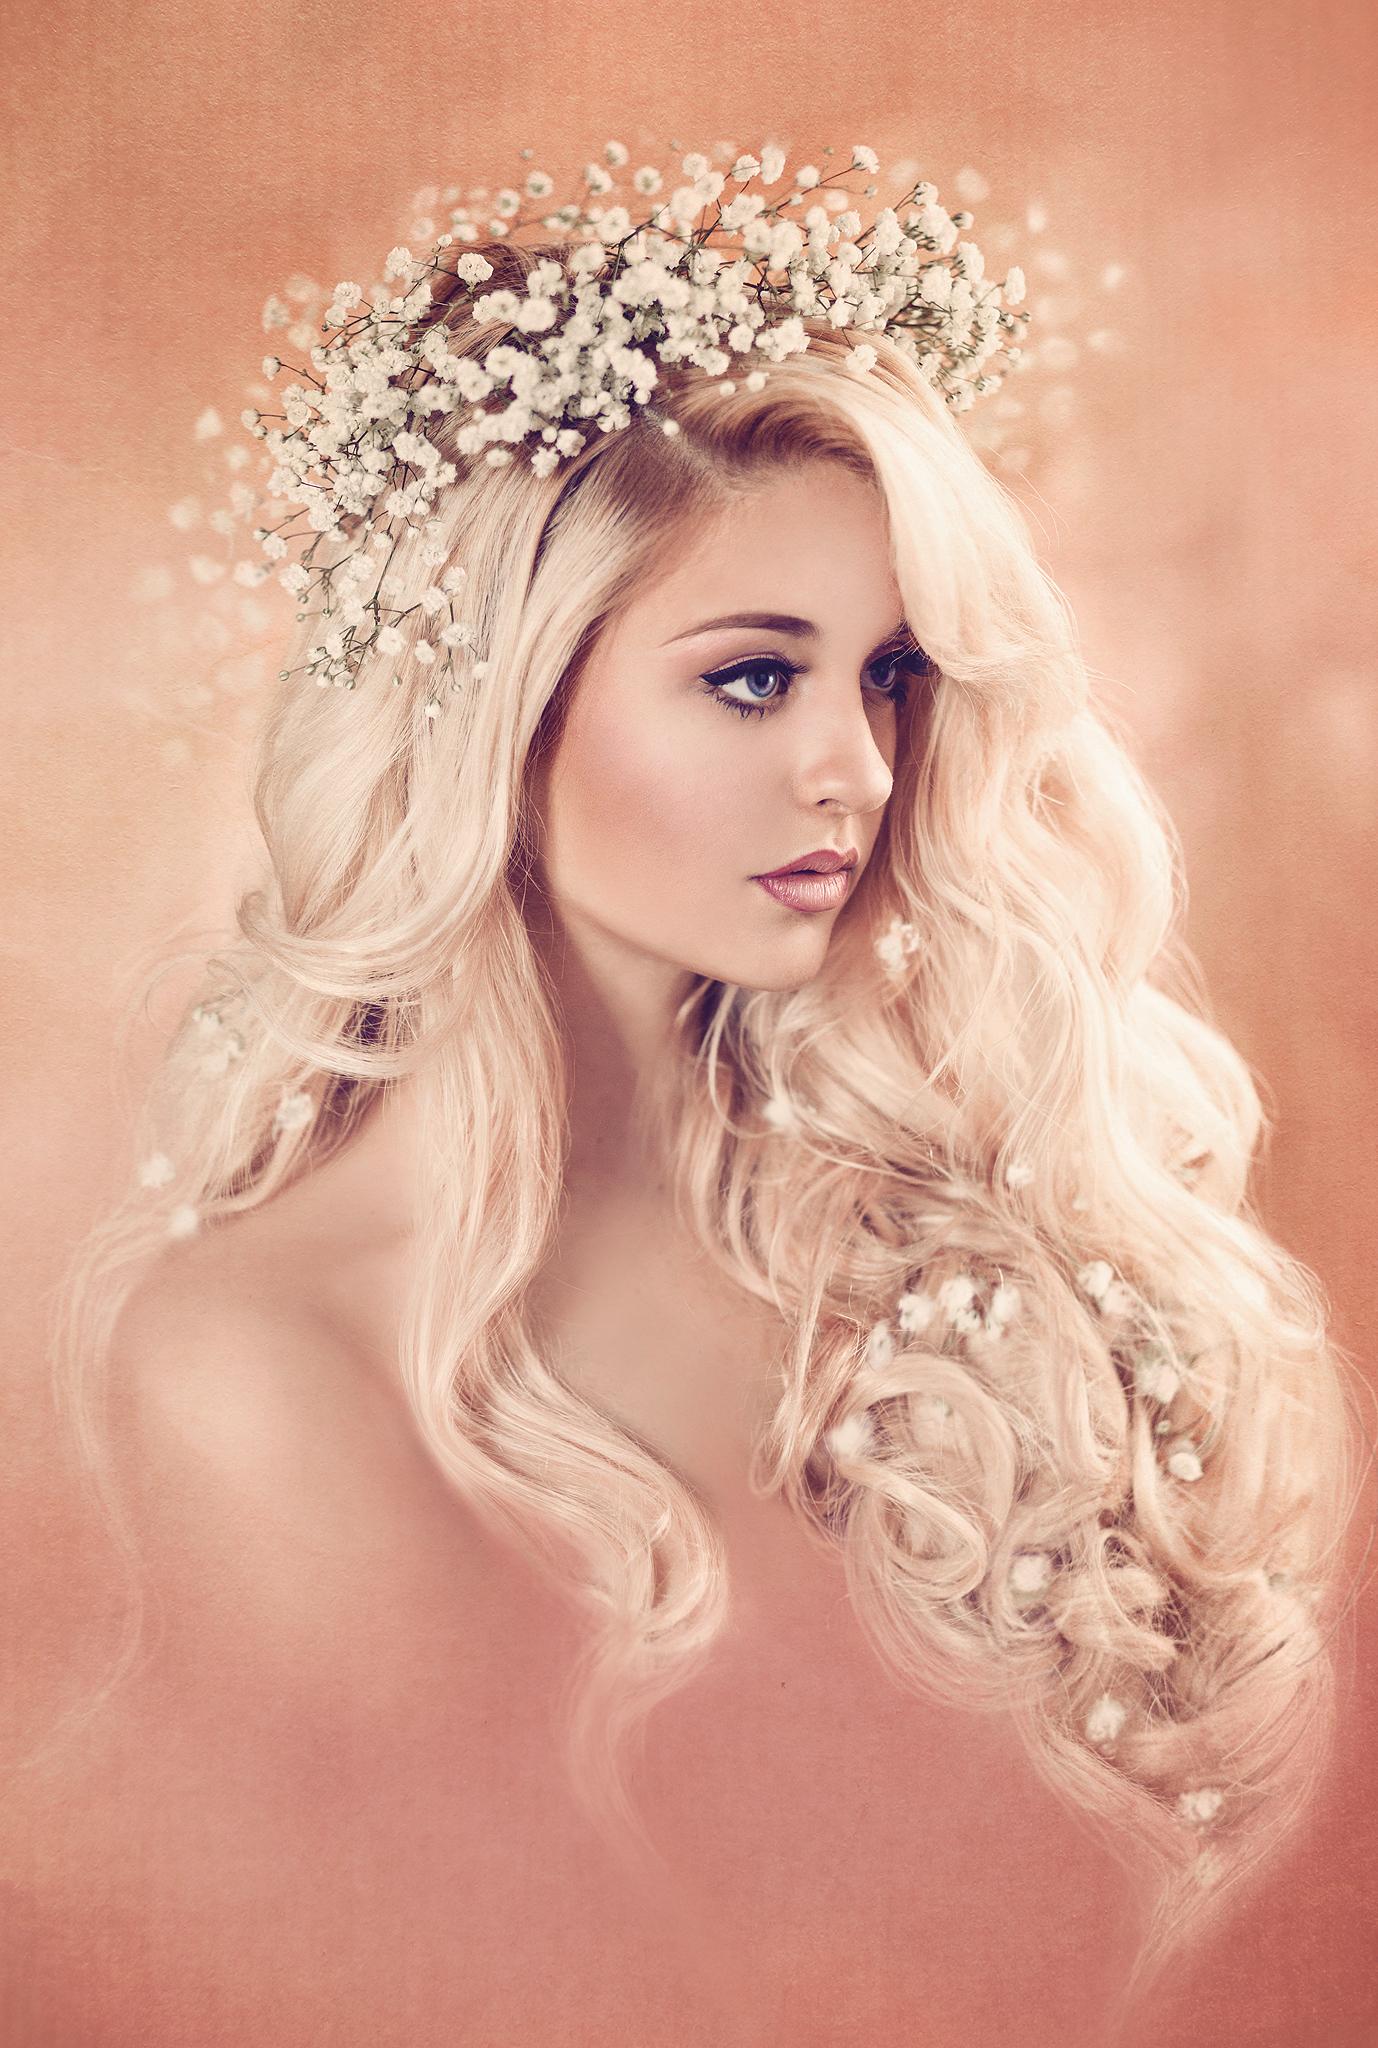 cincinnati and dayton oh conceptual beauty photography.jpg